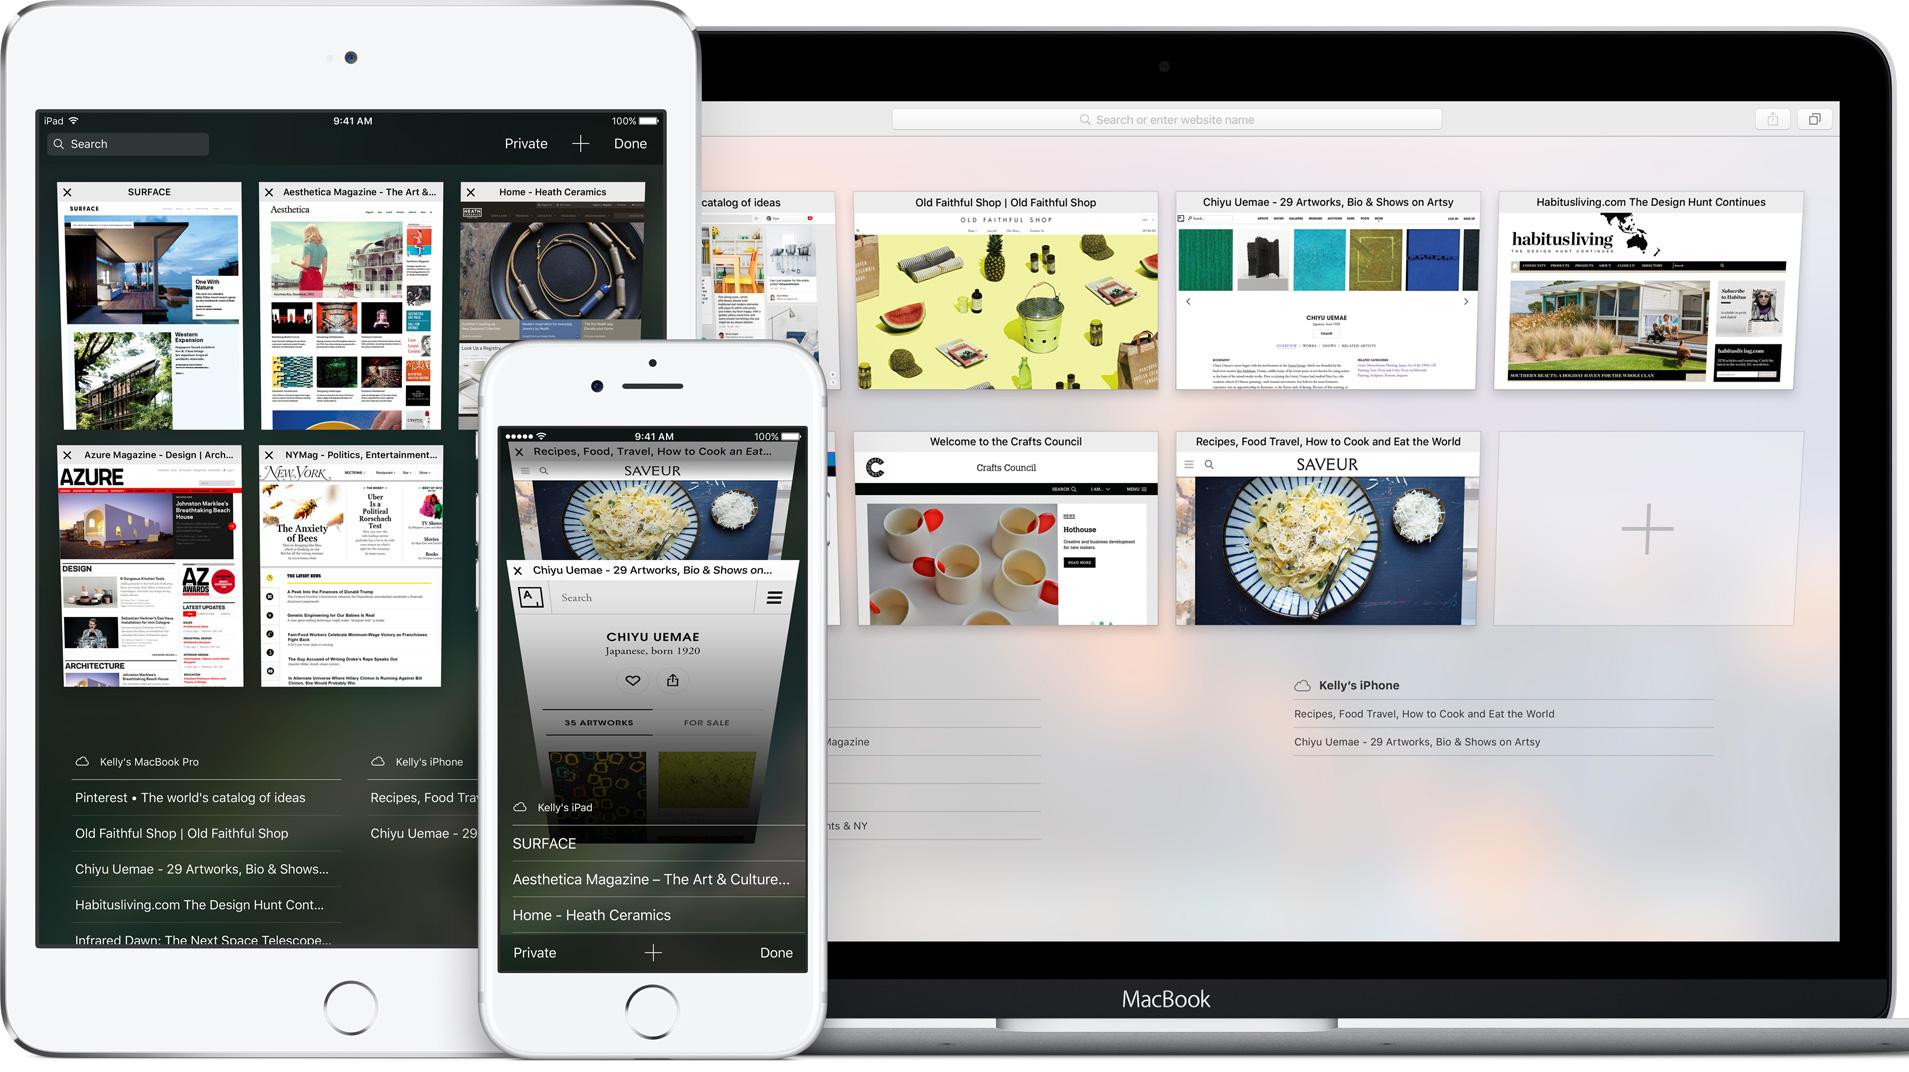 Gegen Fingerprinting: Apple friert Safaris User Agent ein ...